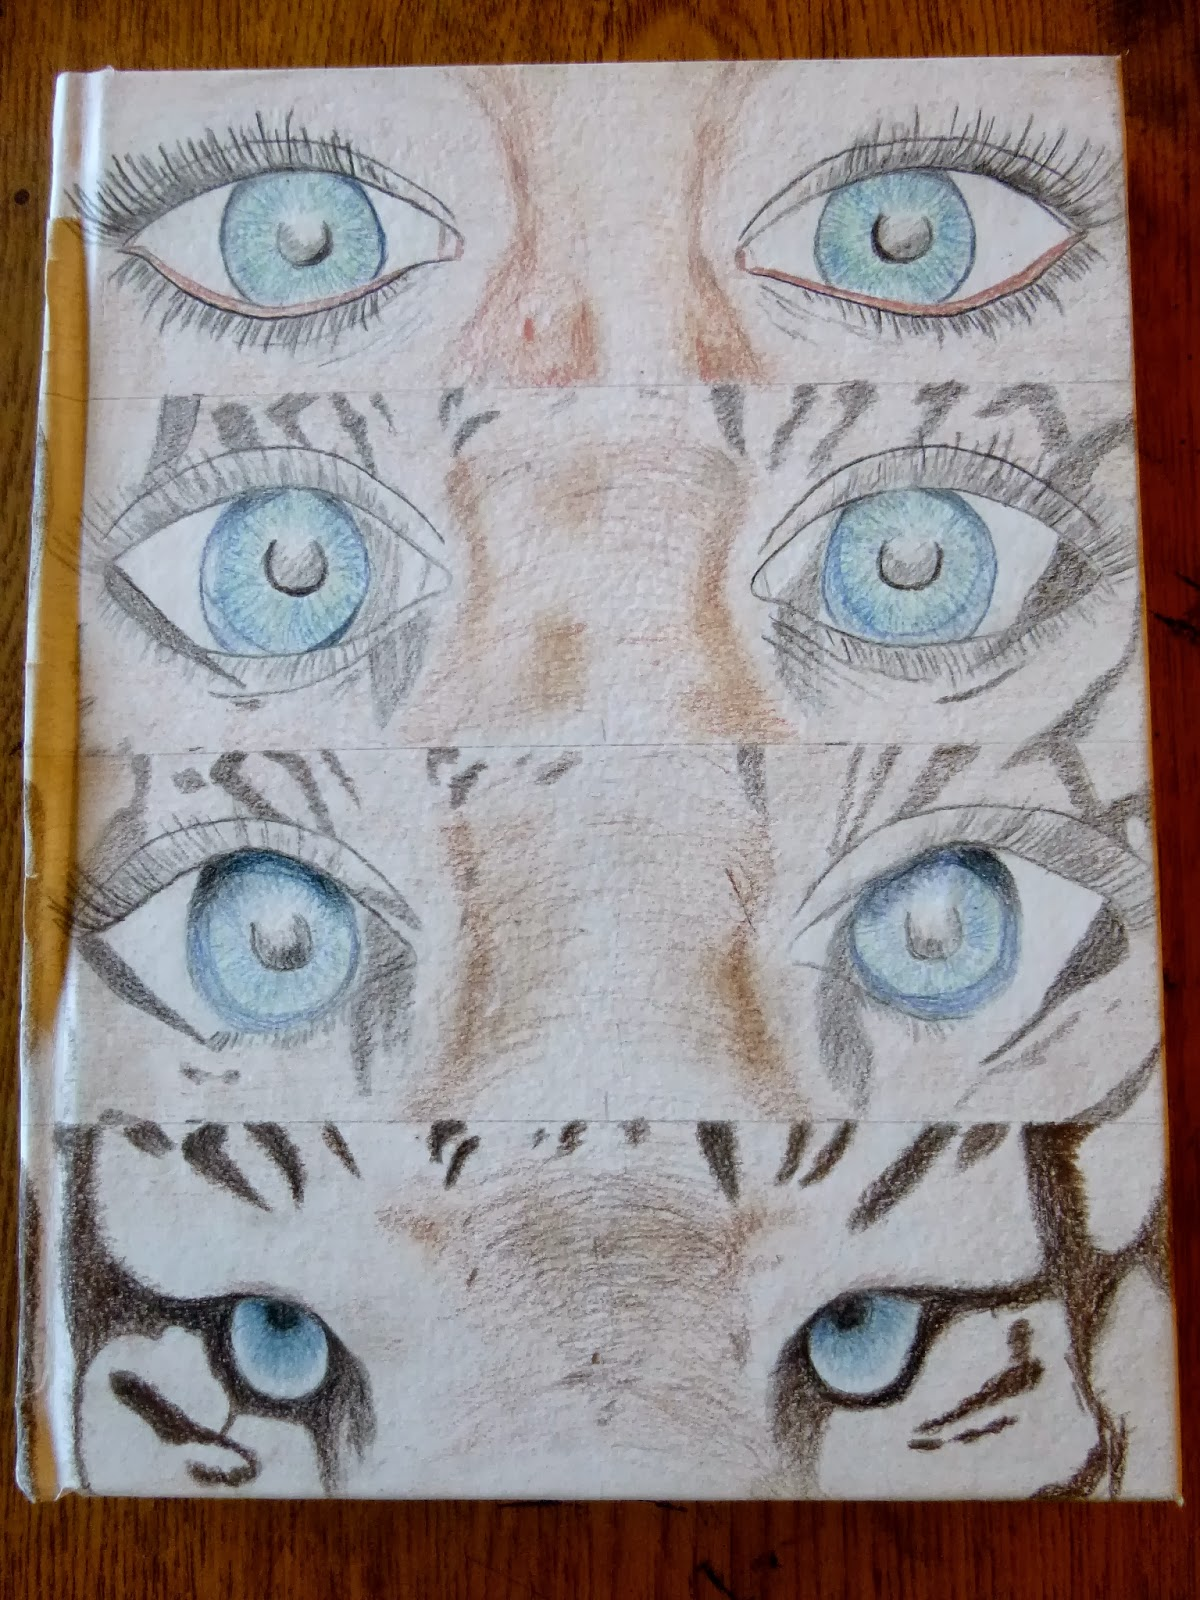 Sketchbook Cover Ideas : Lane tech art studio sketchbook covers